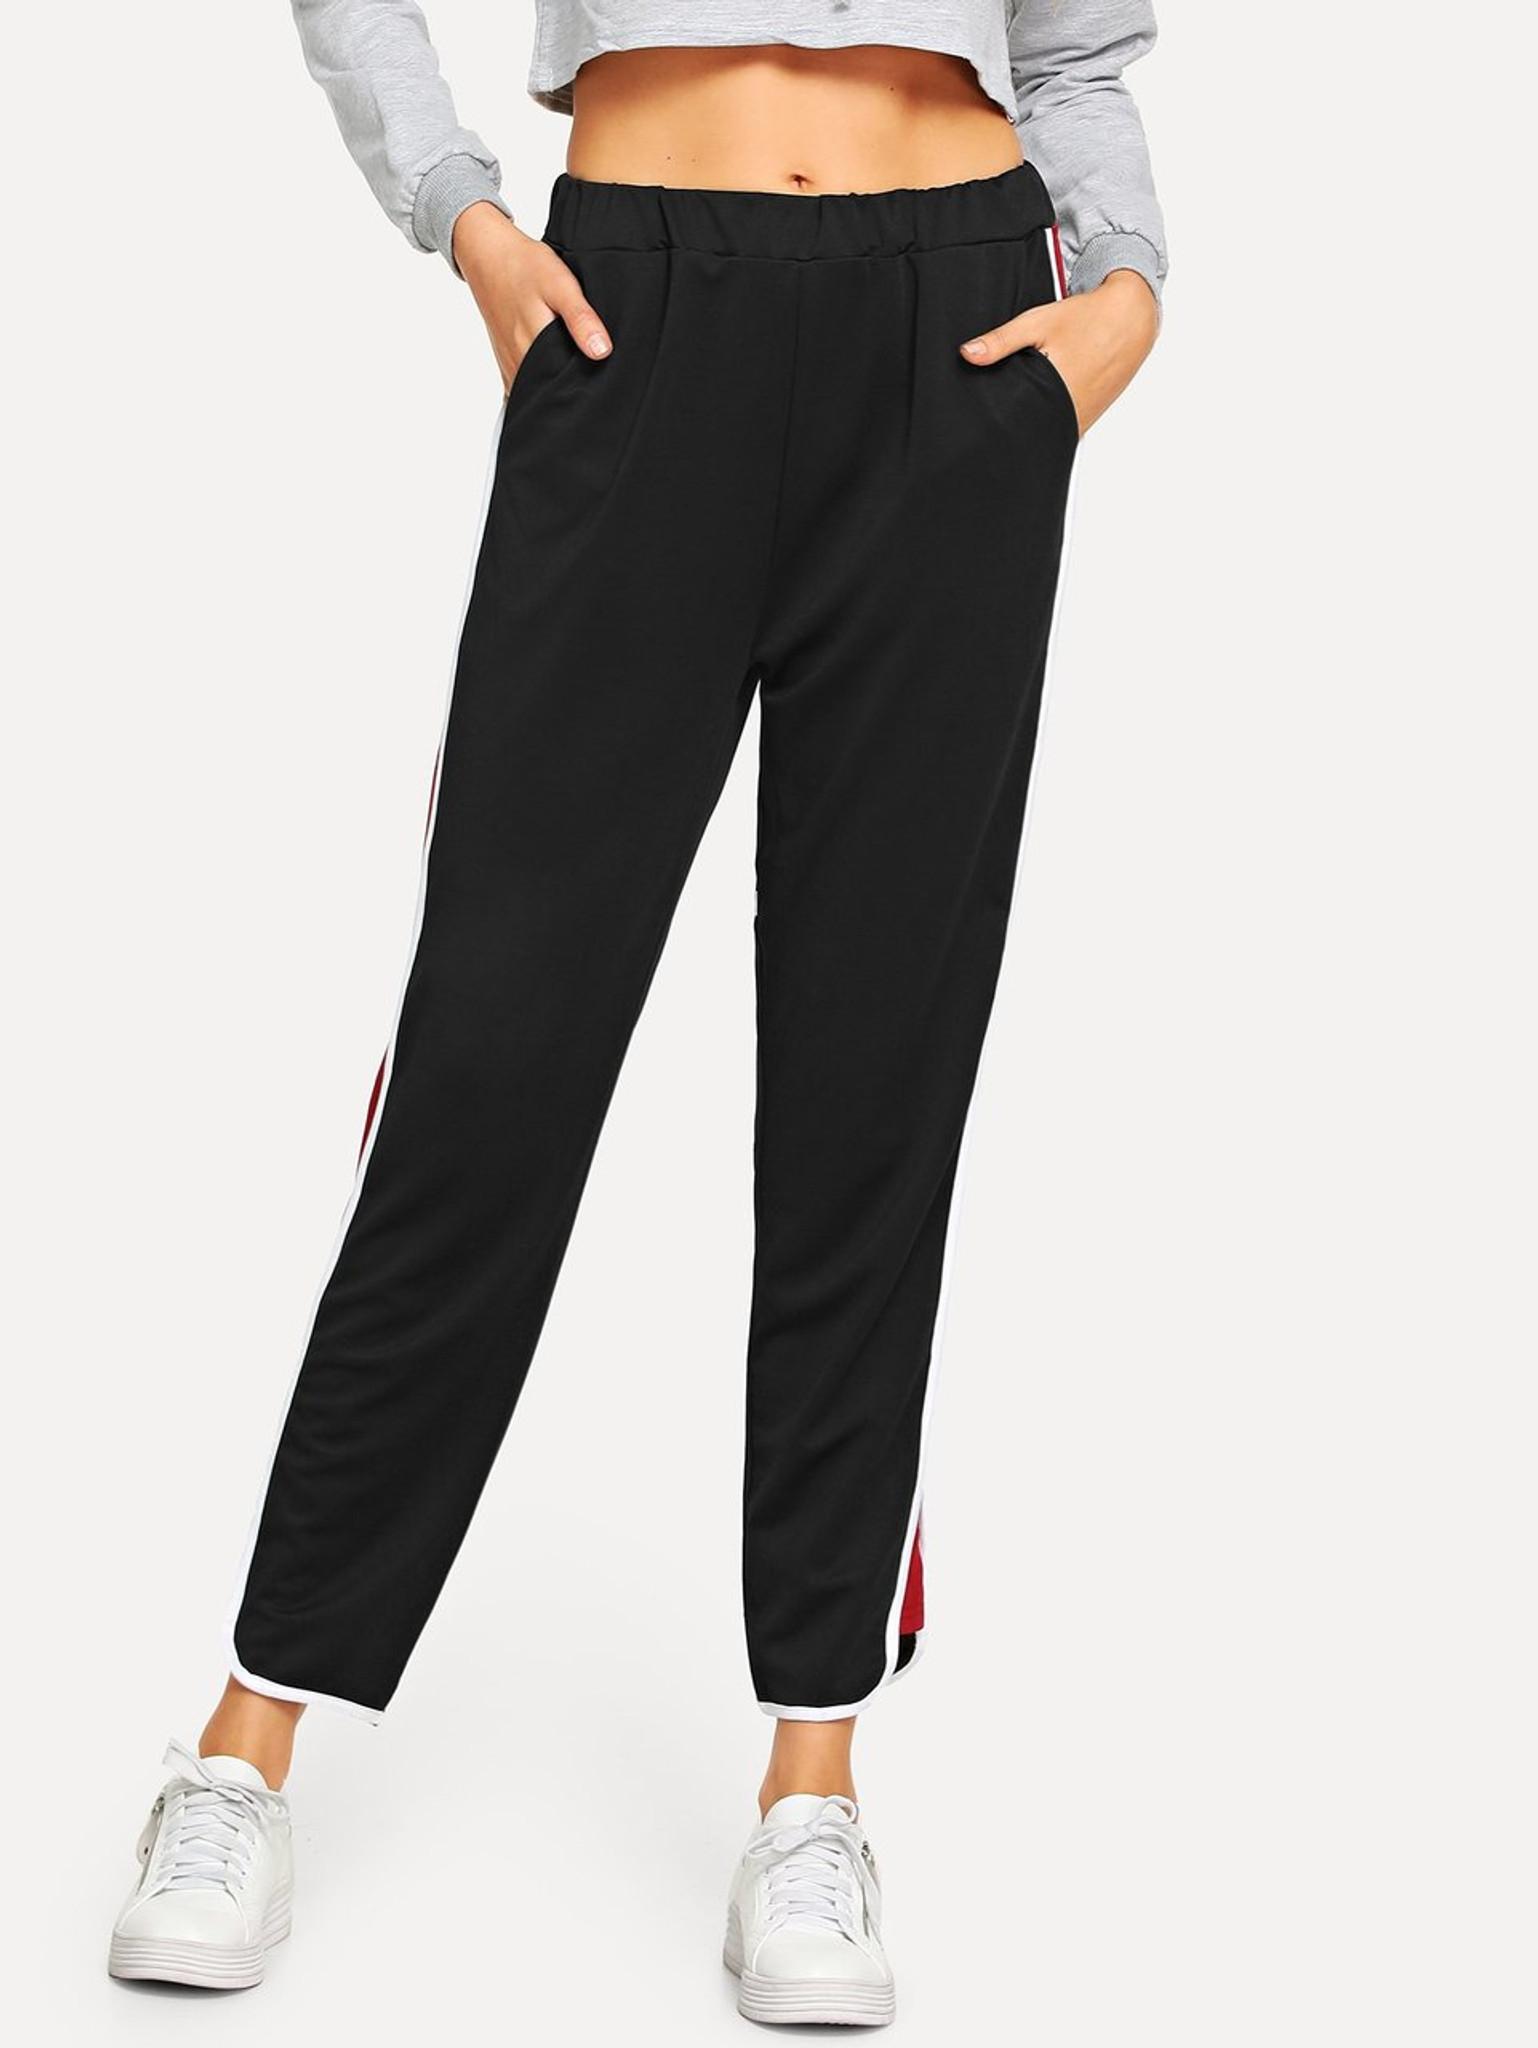 Women's SHIKO Color Block Track Pants by Fifth Avenue - Black